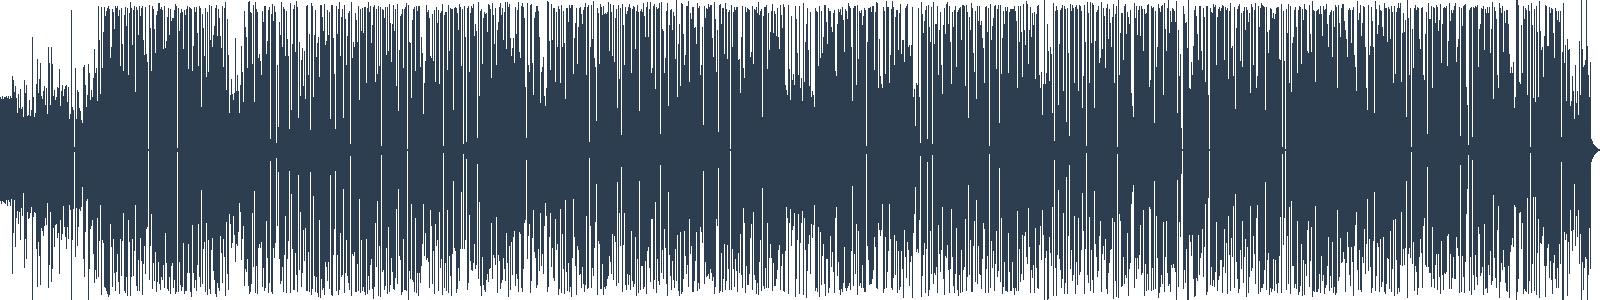 #55 Angus Morton Interview waveform